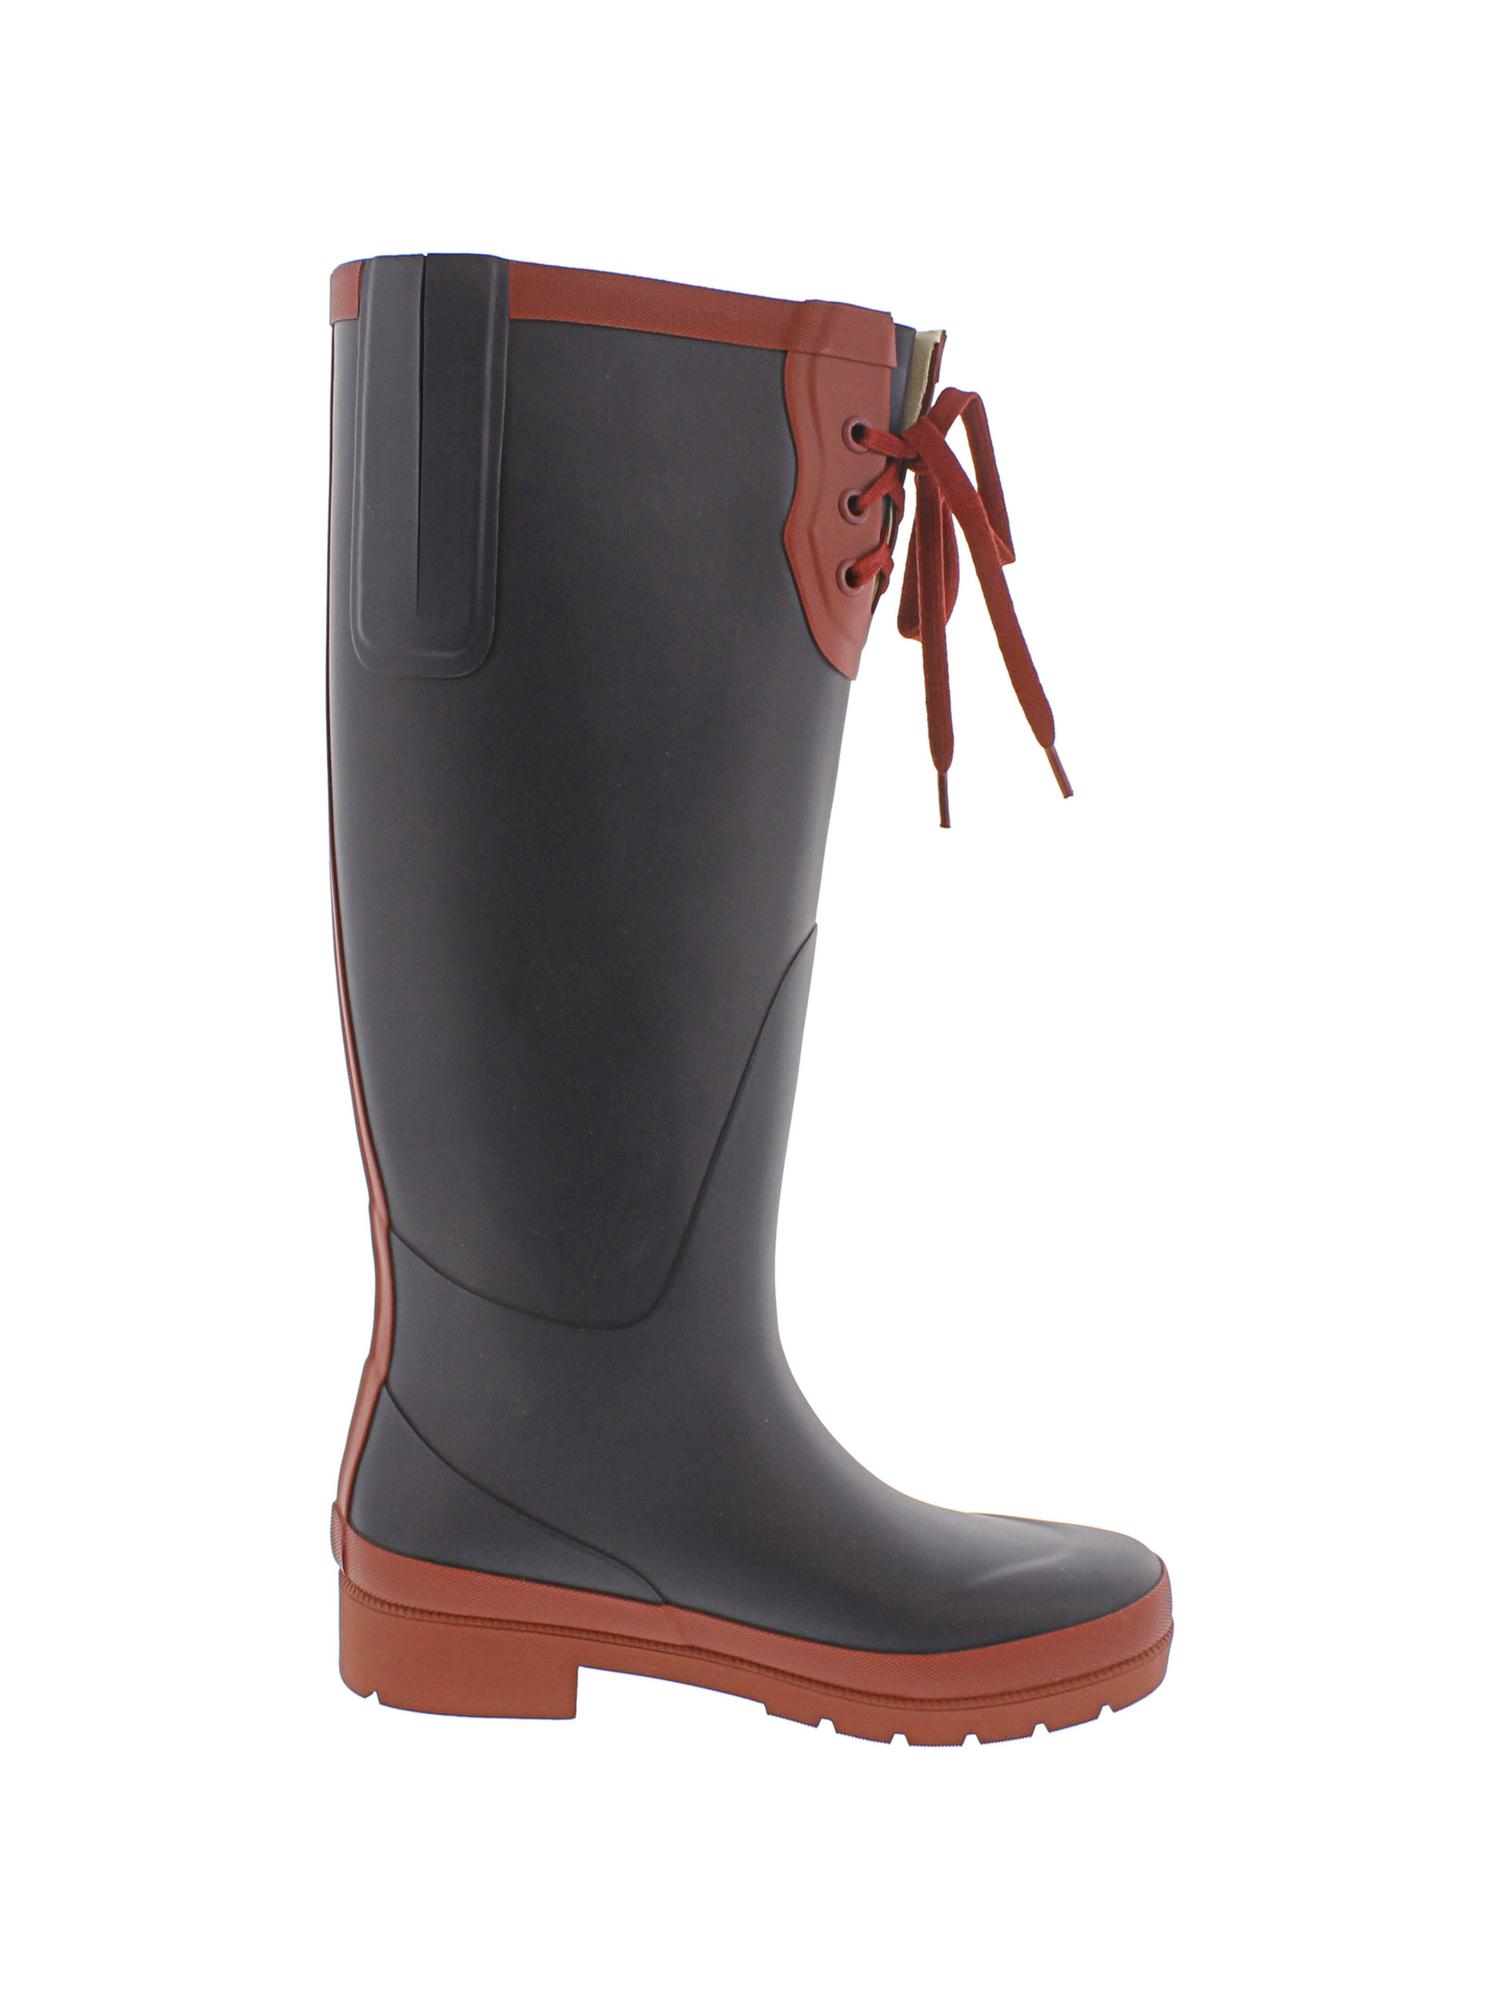 Tretorn-Women-039-s-Lacey-Rubber-Knee-High-Rain-Boot thumbnail 8